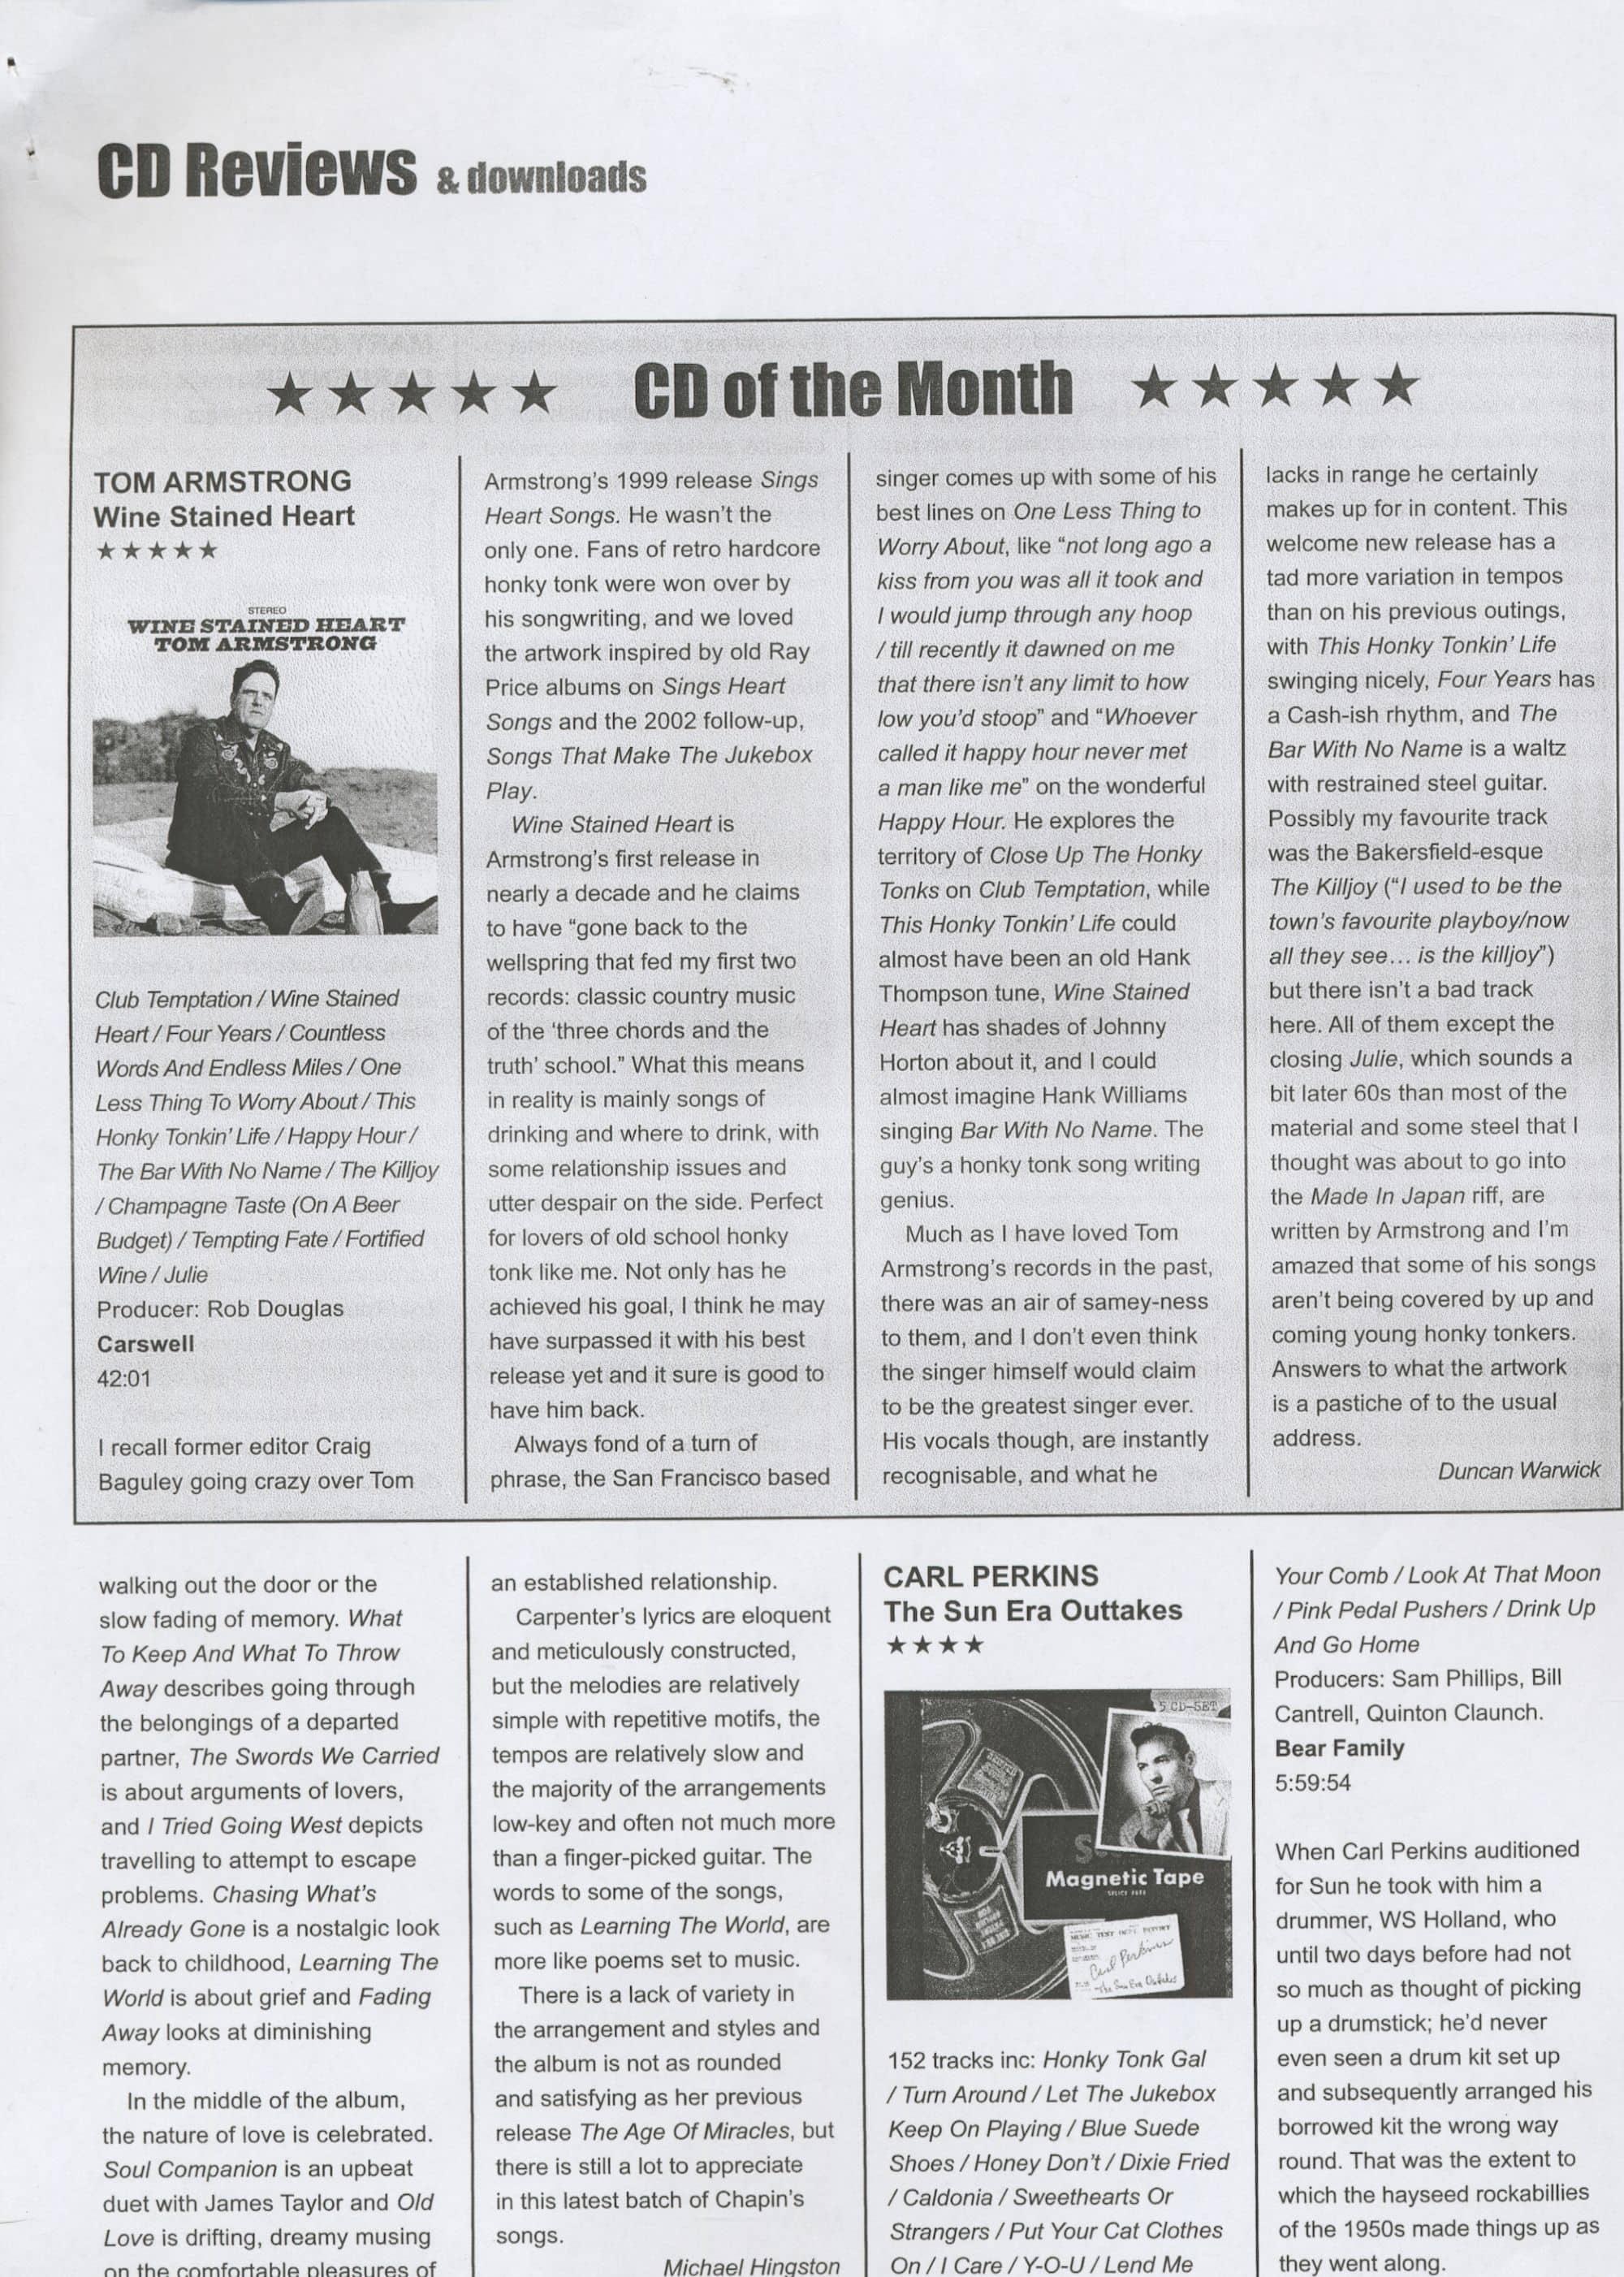 Press Archive - Carl Perkins -Press Archive - Carl Perkins - The Sun